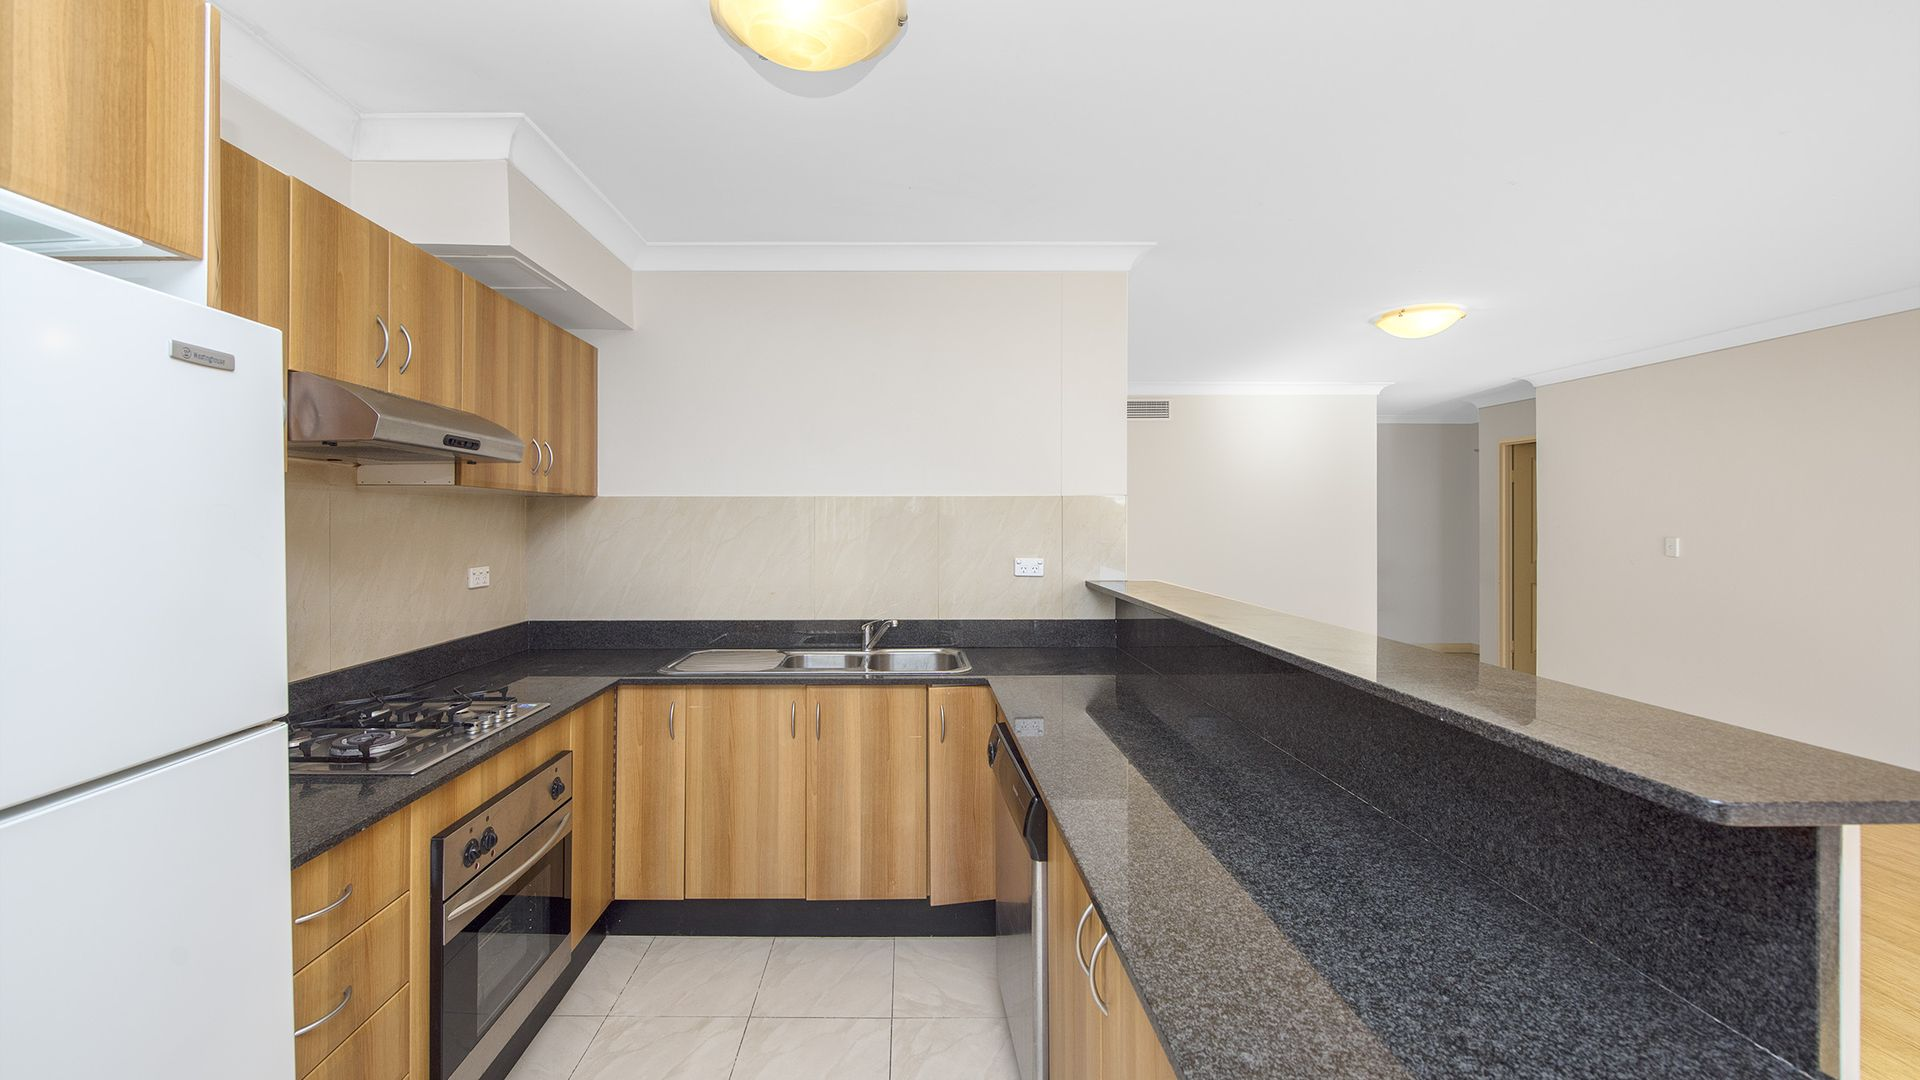 87/1-3 Beresford Road, Strathfield NSW 2135, Image 1